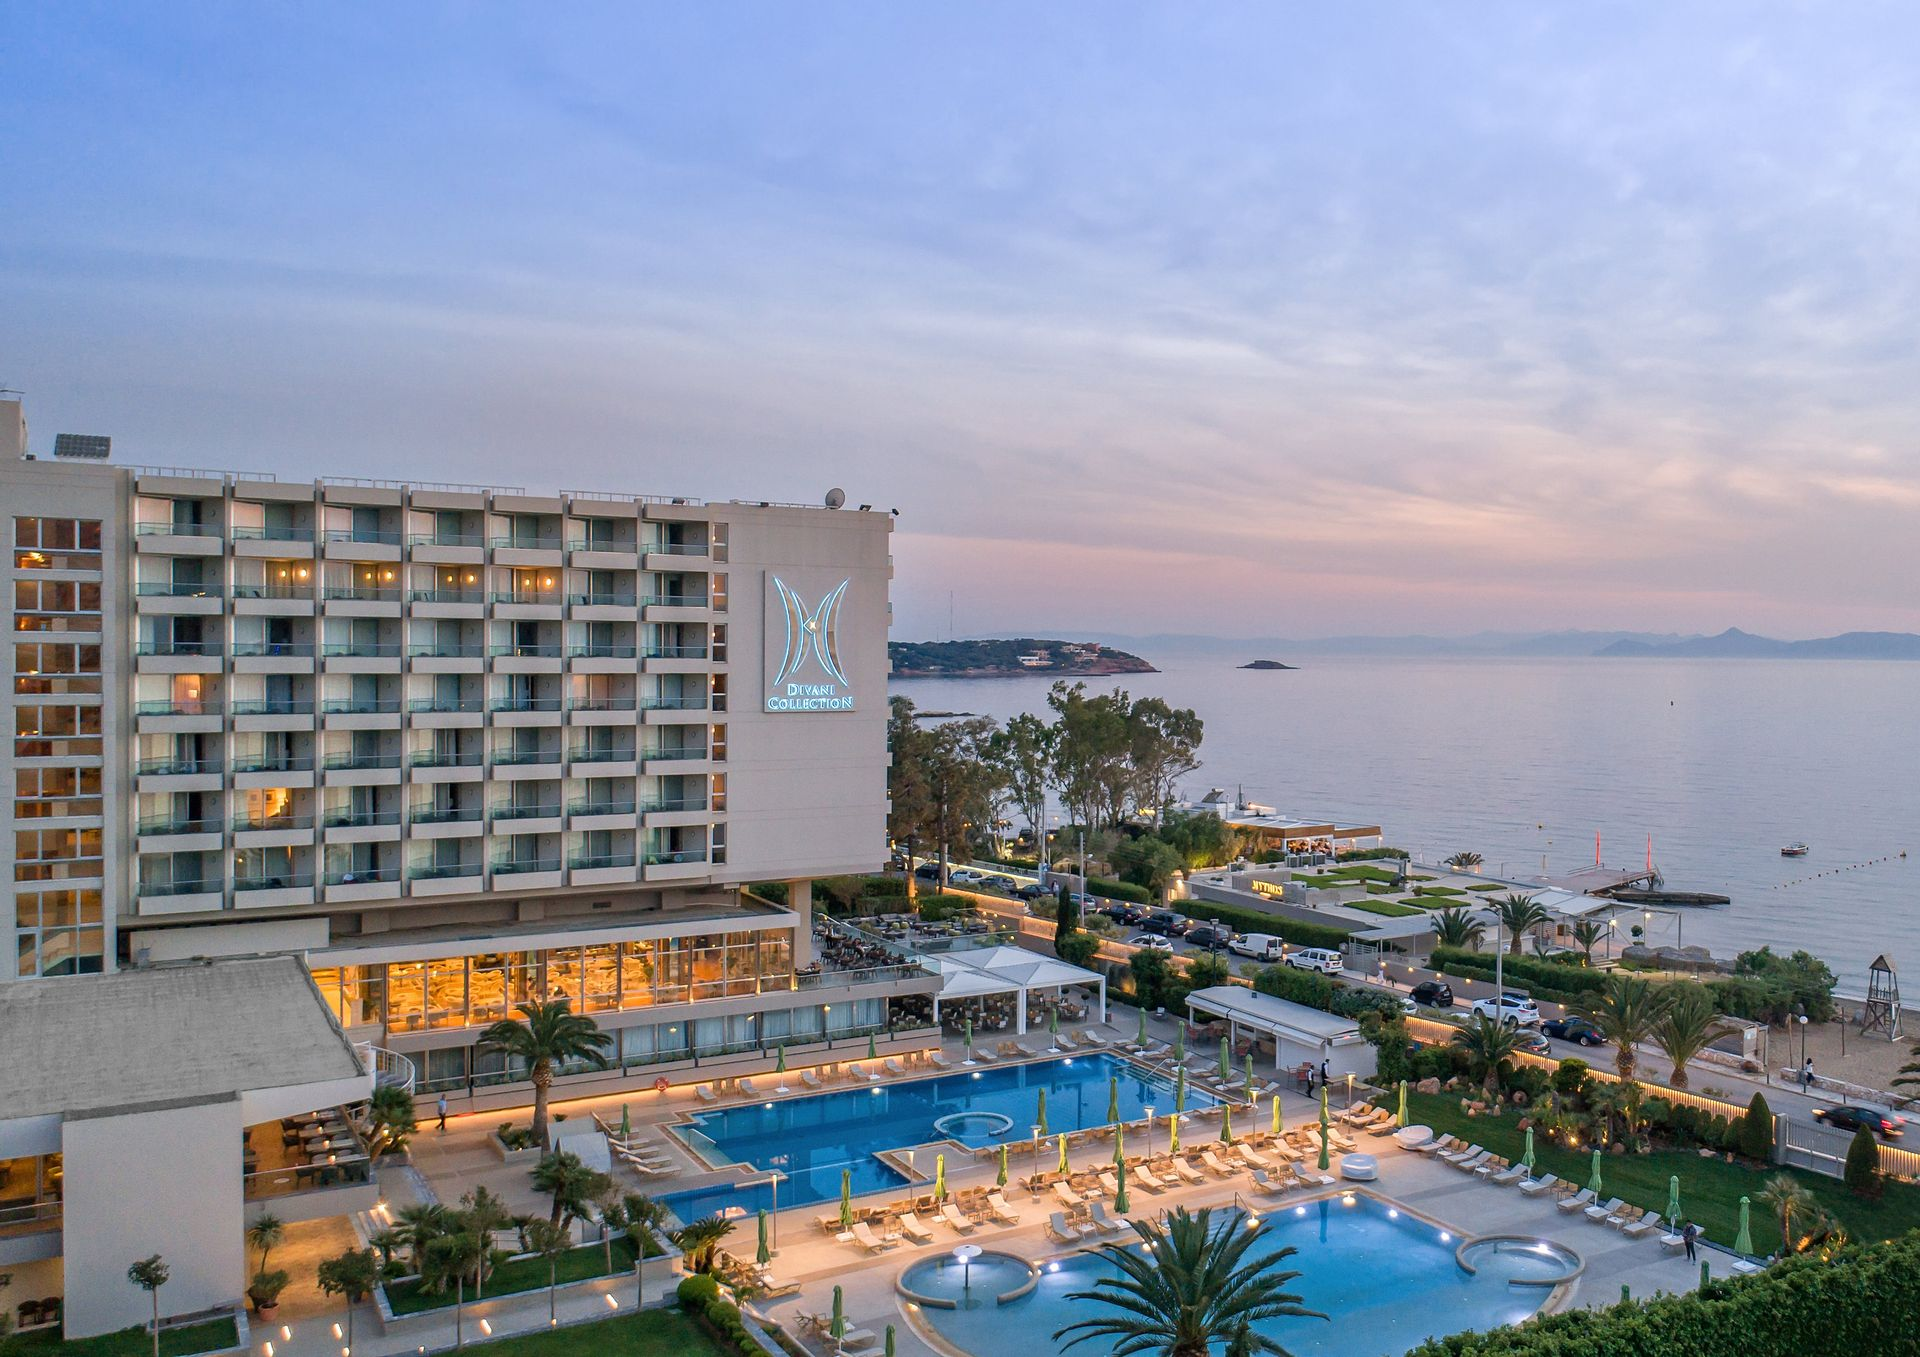 Divani Apollon Palace & Thalasso | Athens Riviera - Offers - Cyber Monday